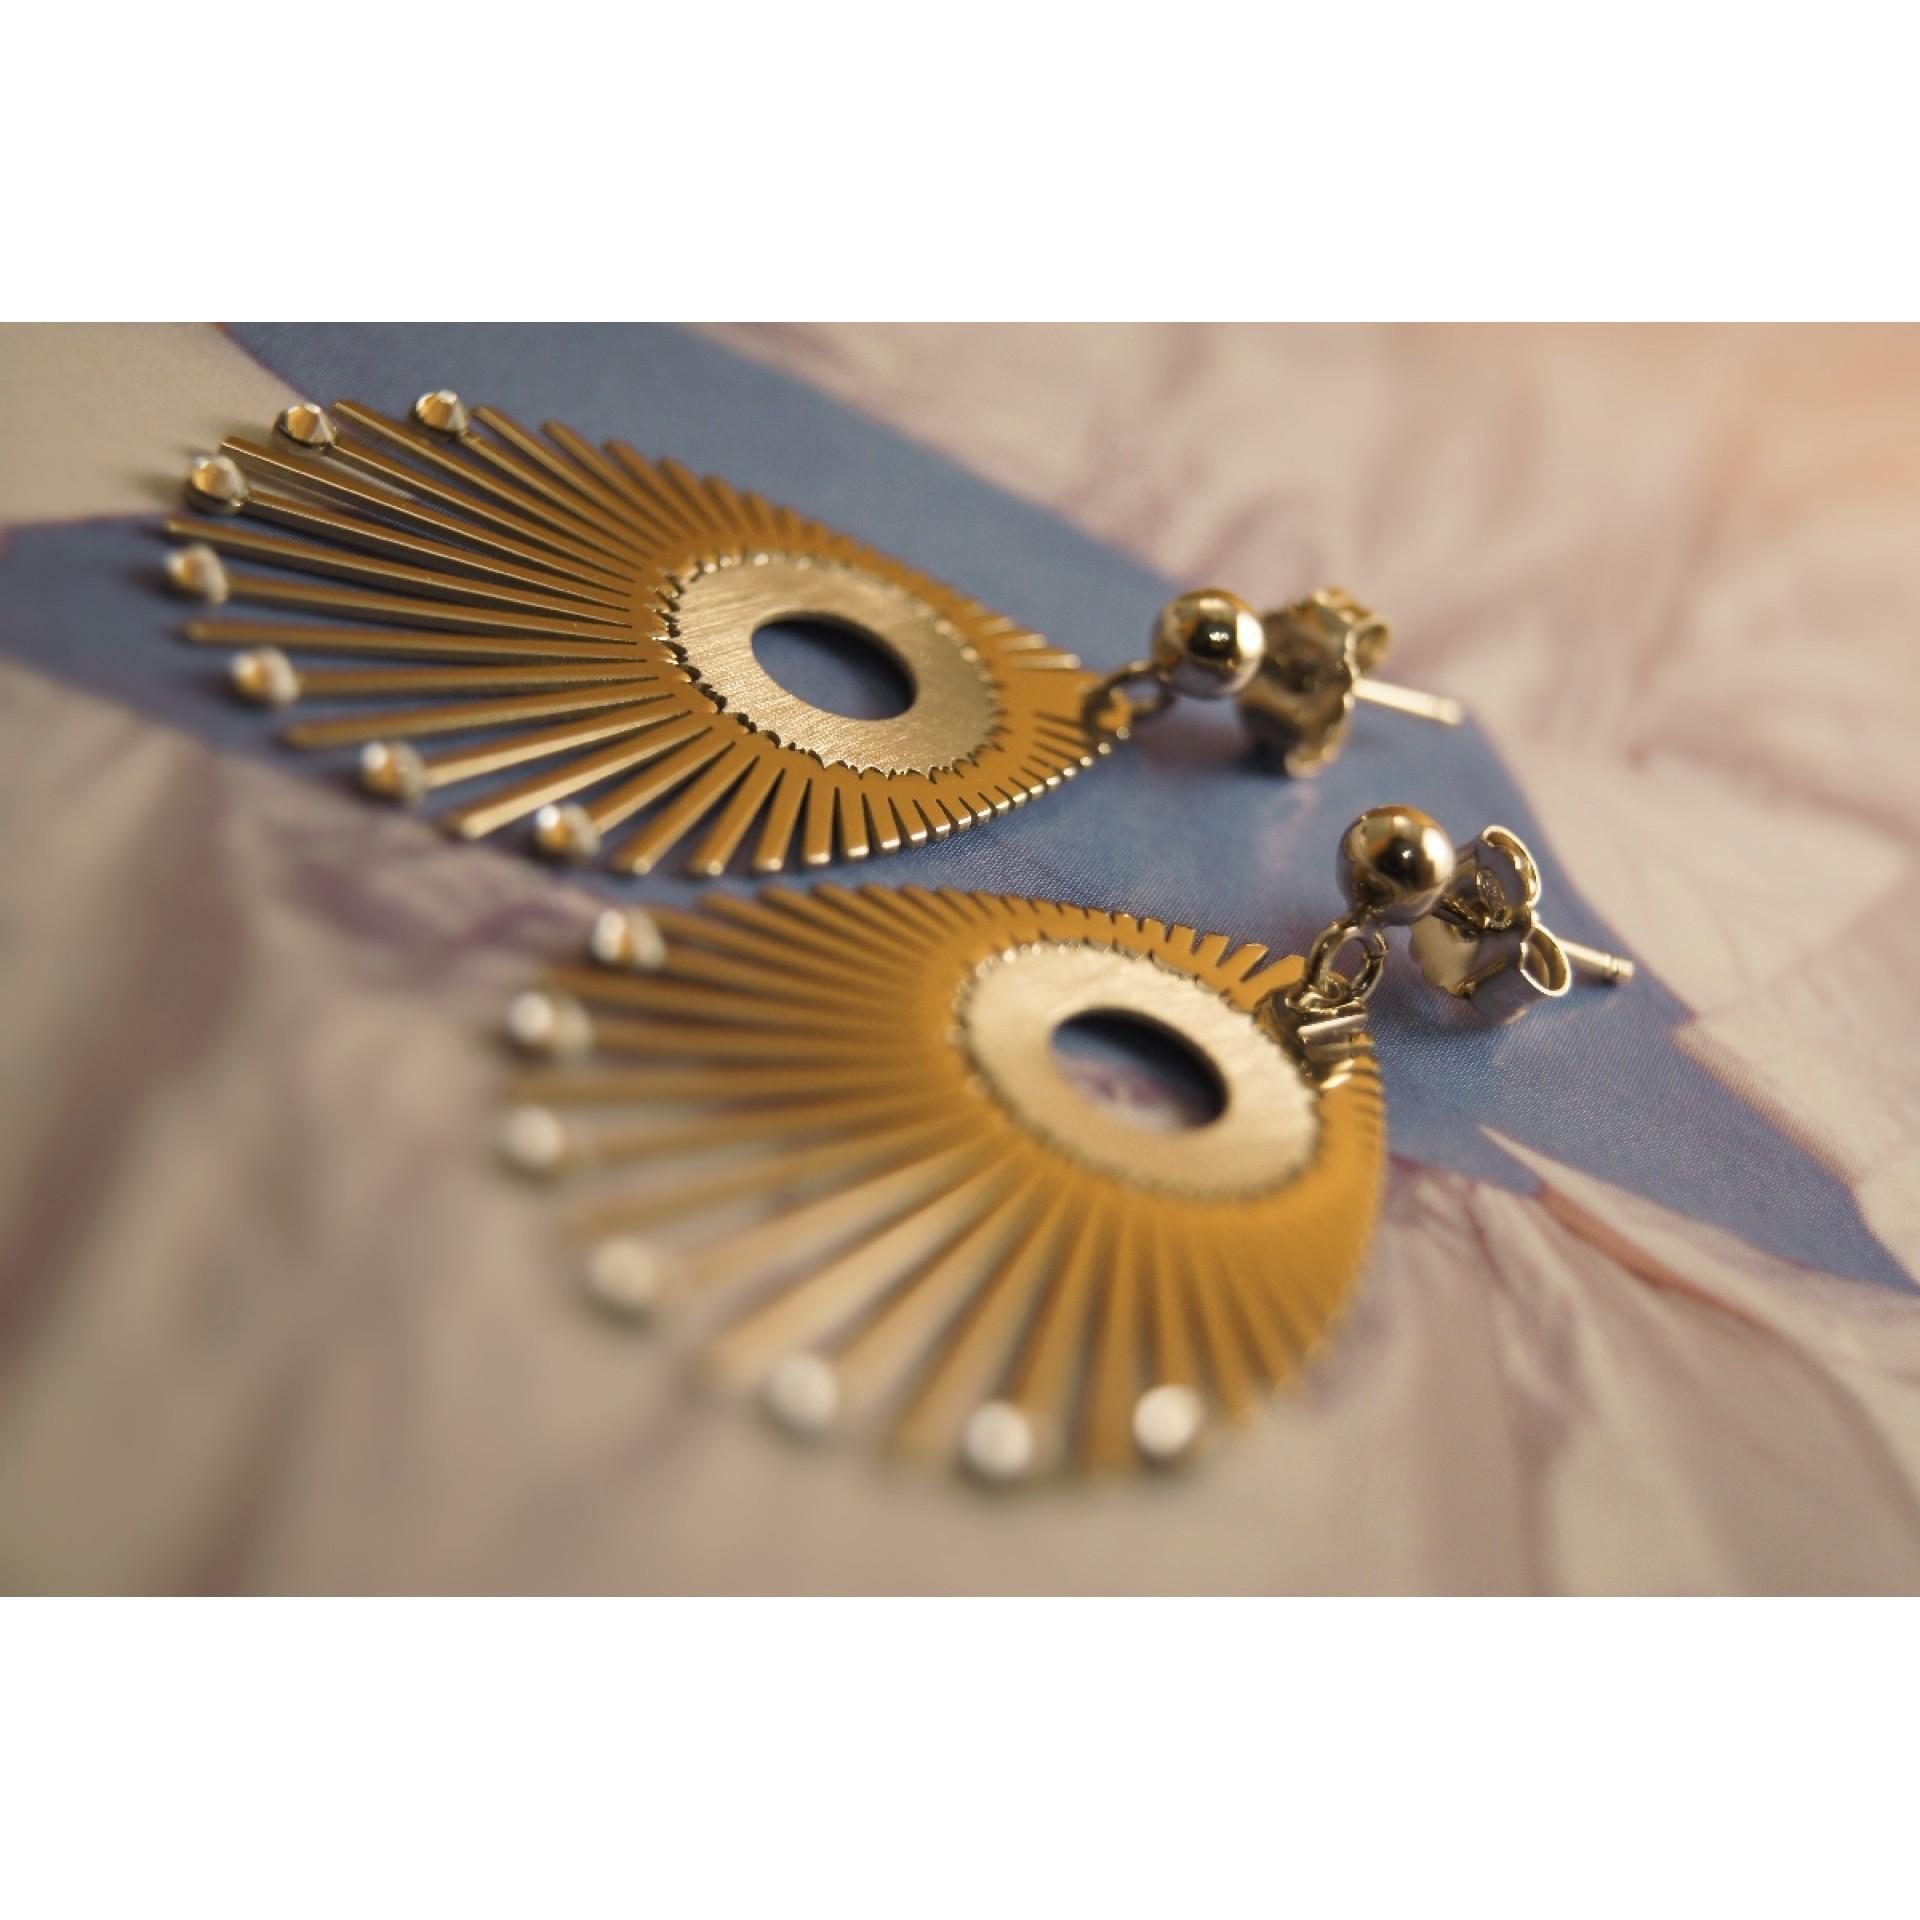 The Nymph mini in Golden Satin silver earrings